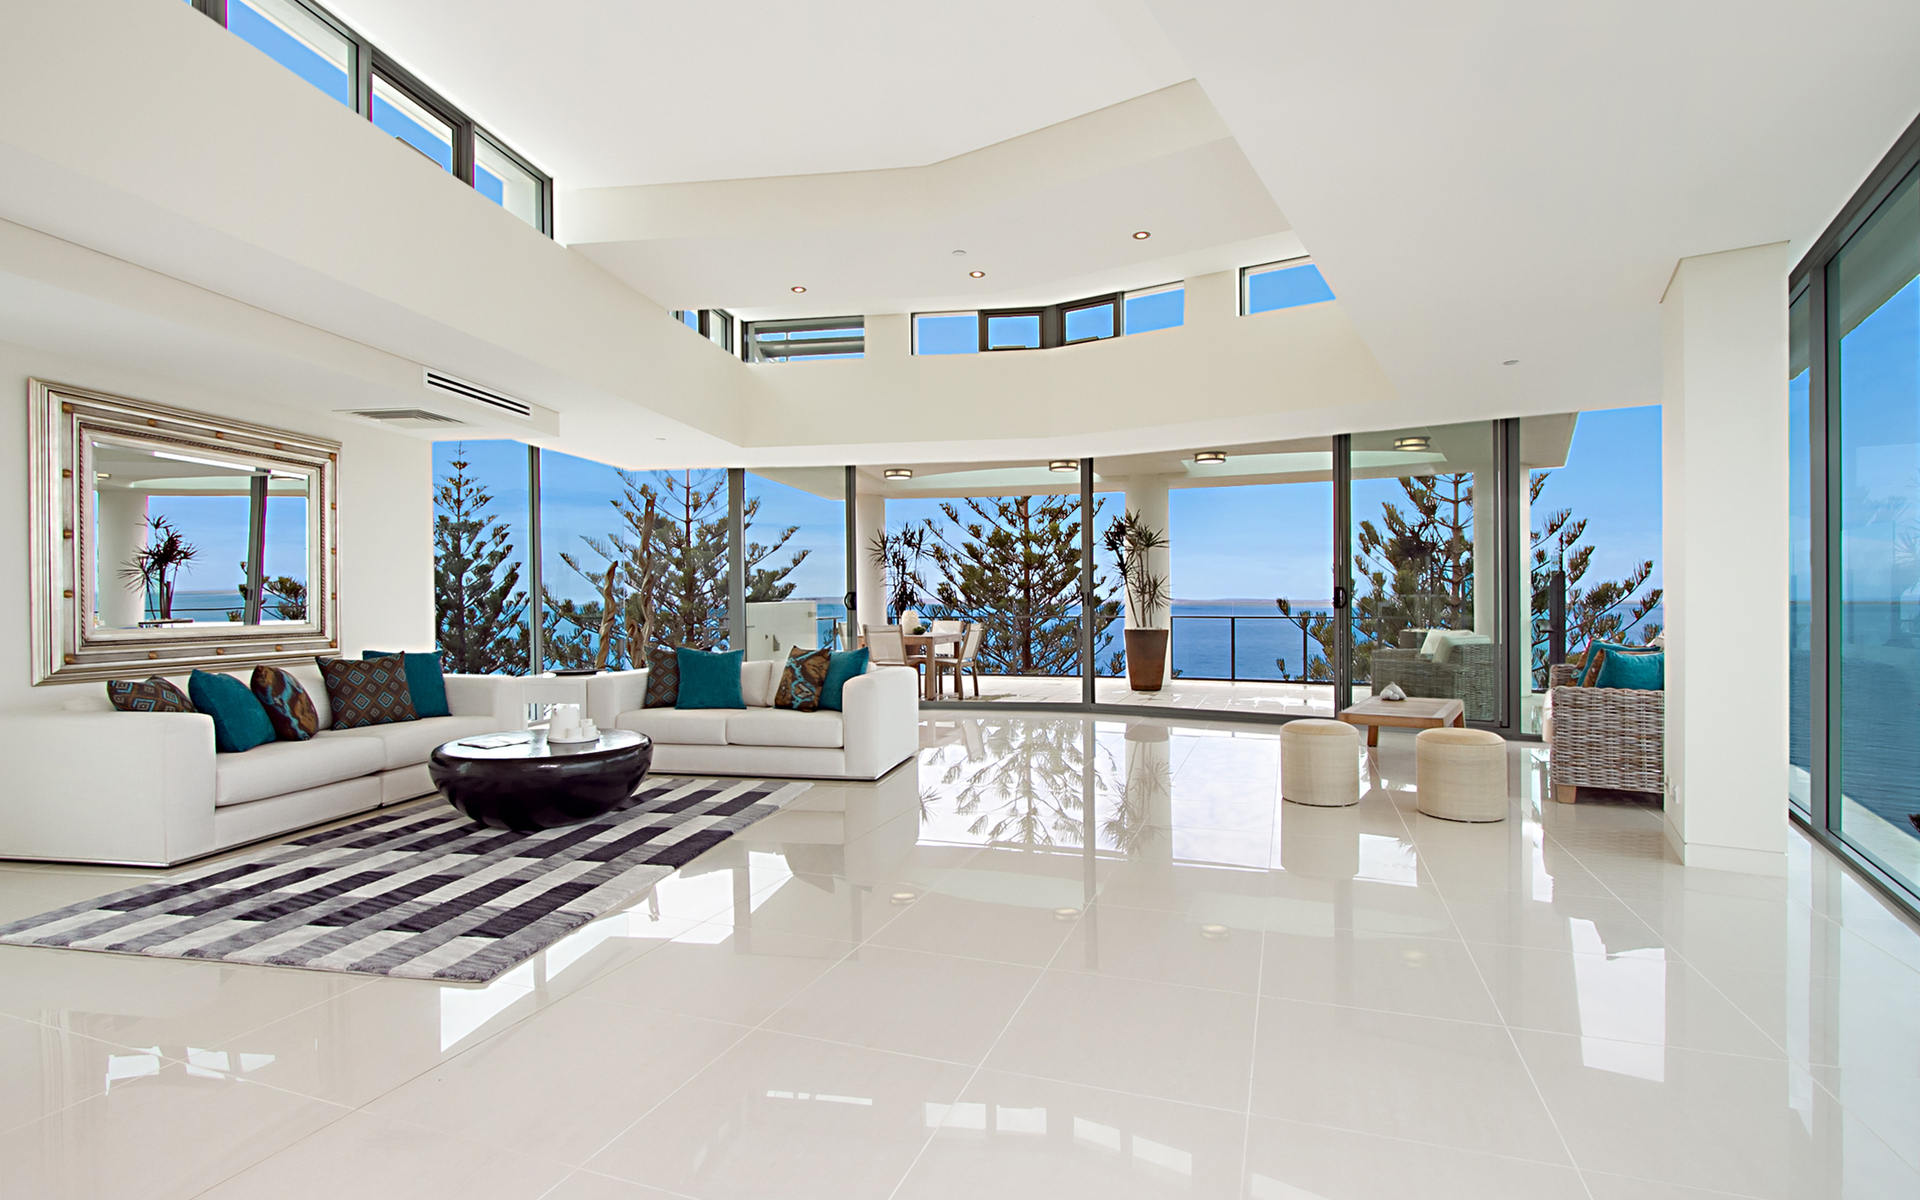 . 87   Luxury House Wallpapers on WallpaperSafari